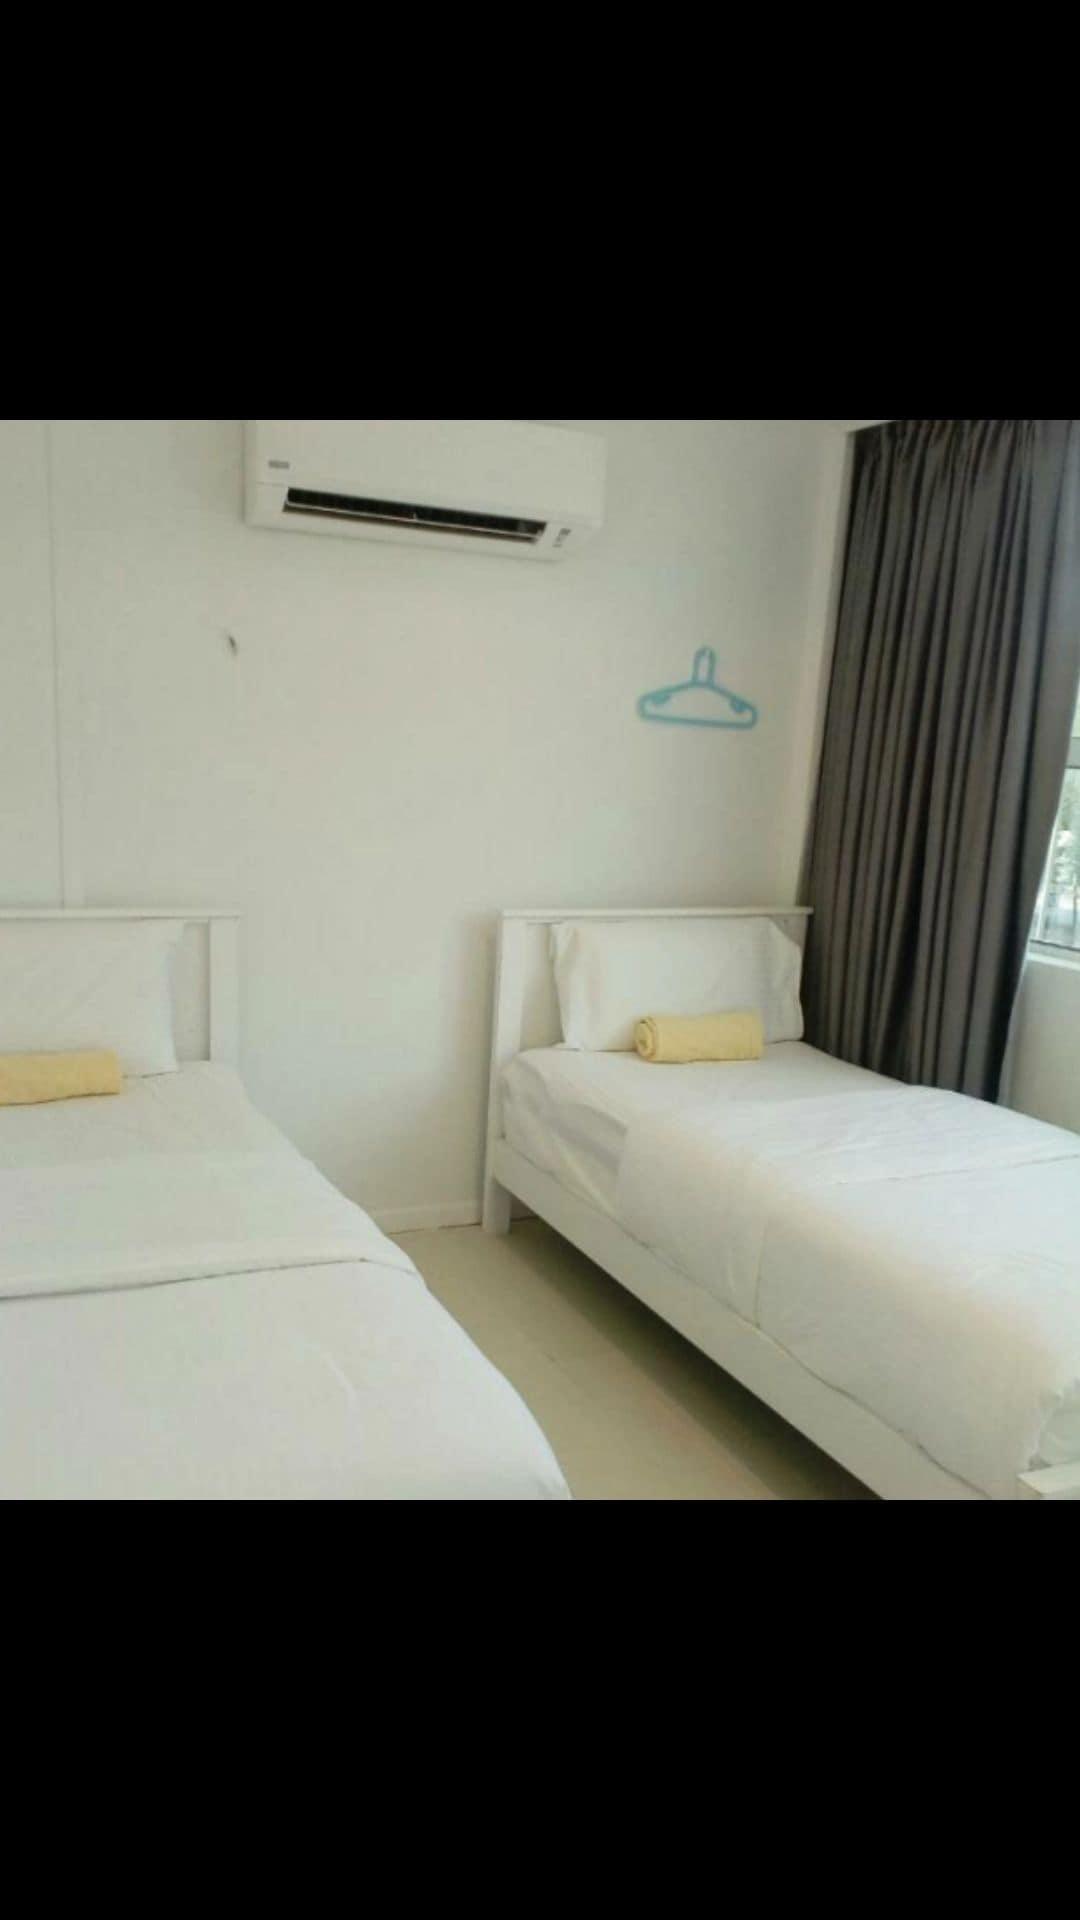 W8 homestay - Hostel, Perlis